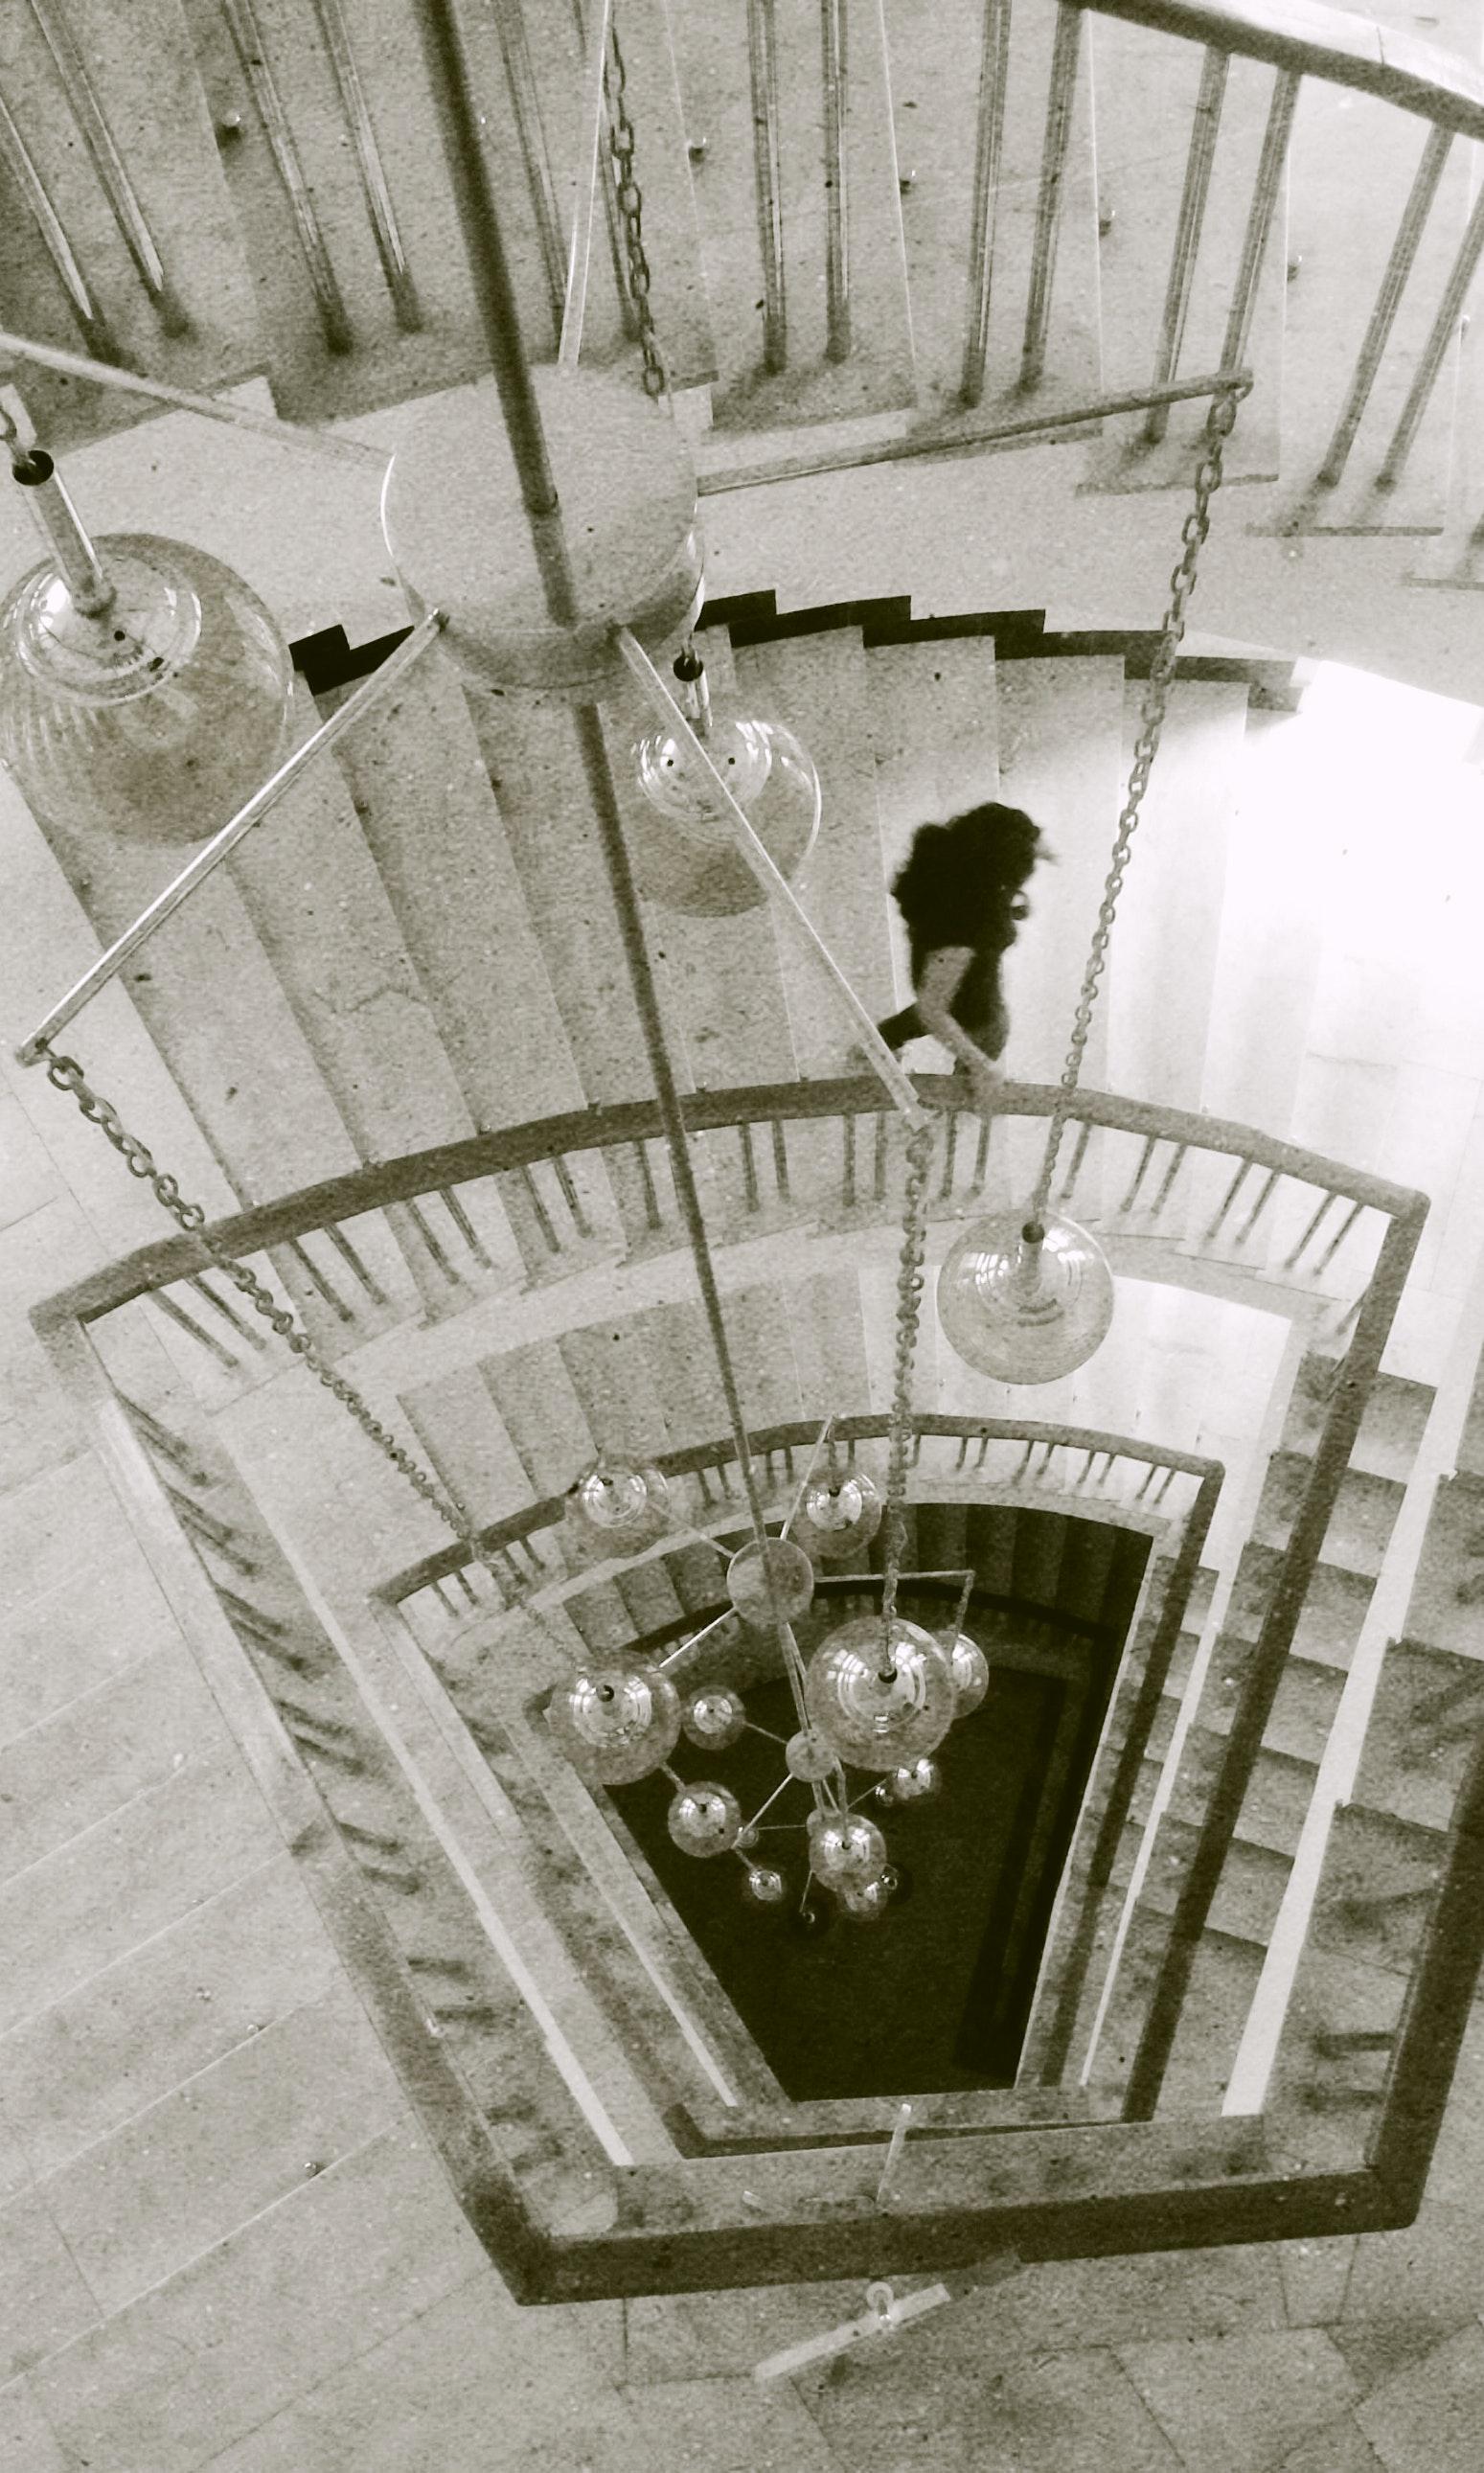 aua-steps-yerevan-176404.jpg